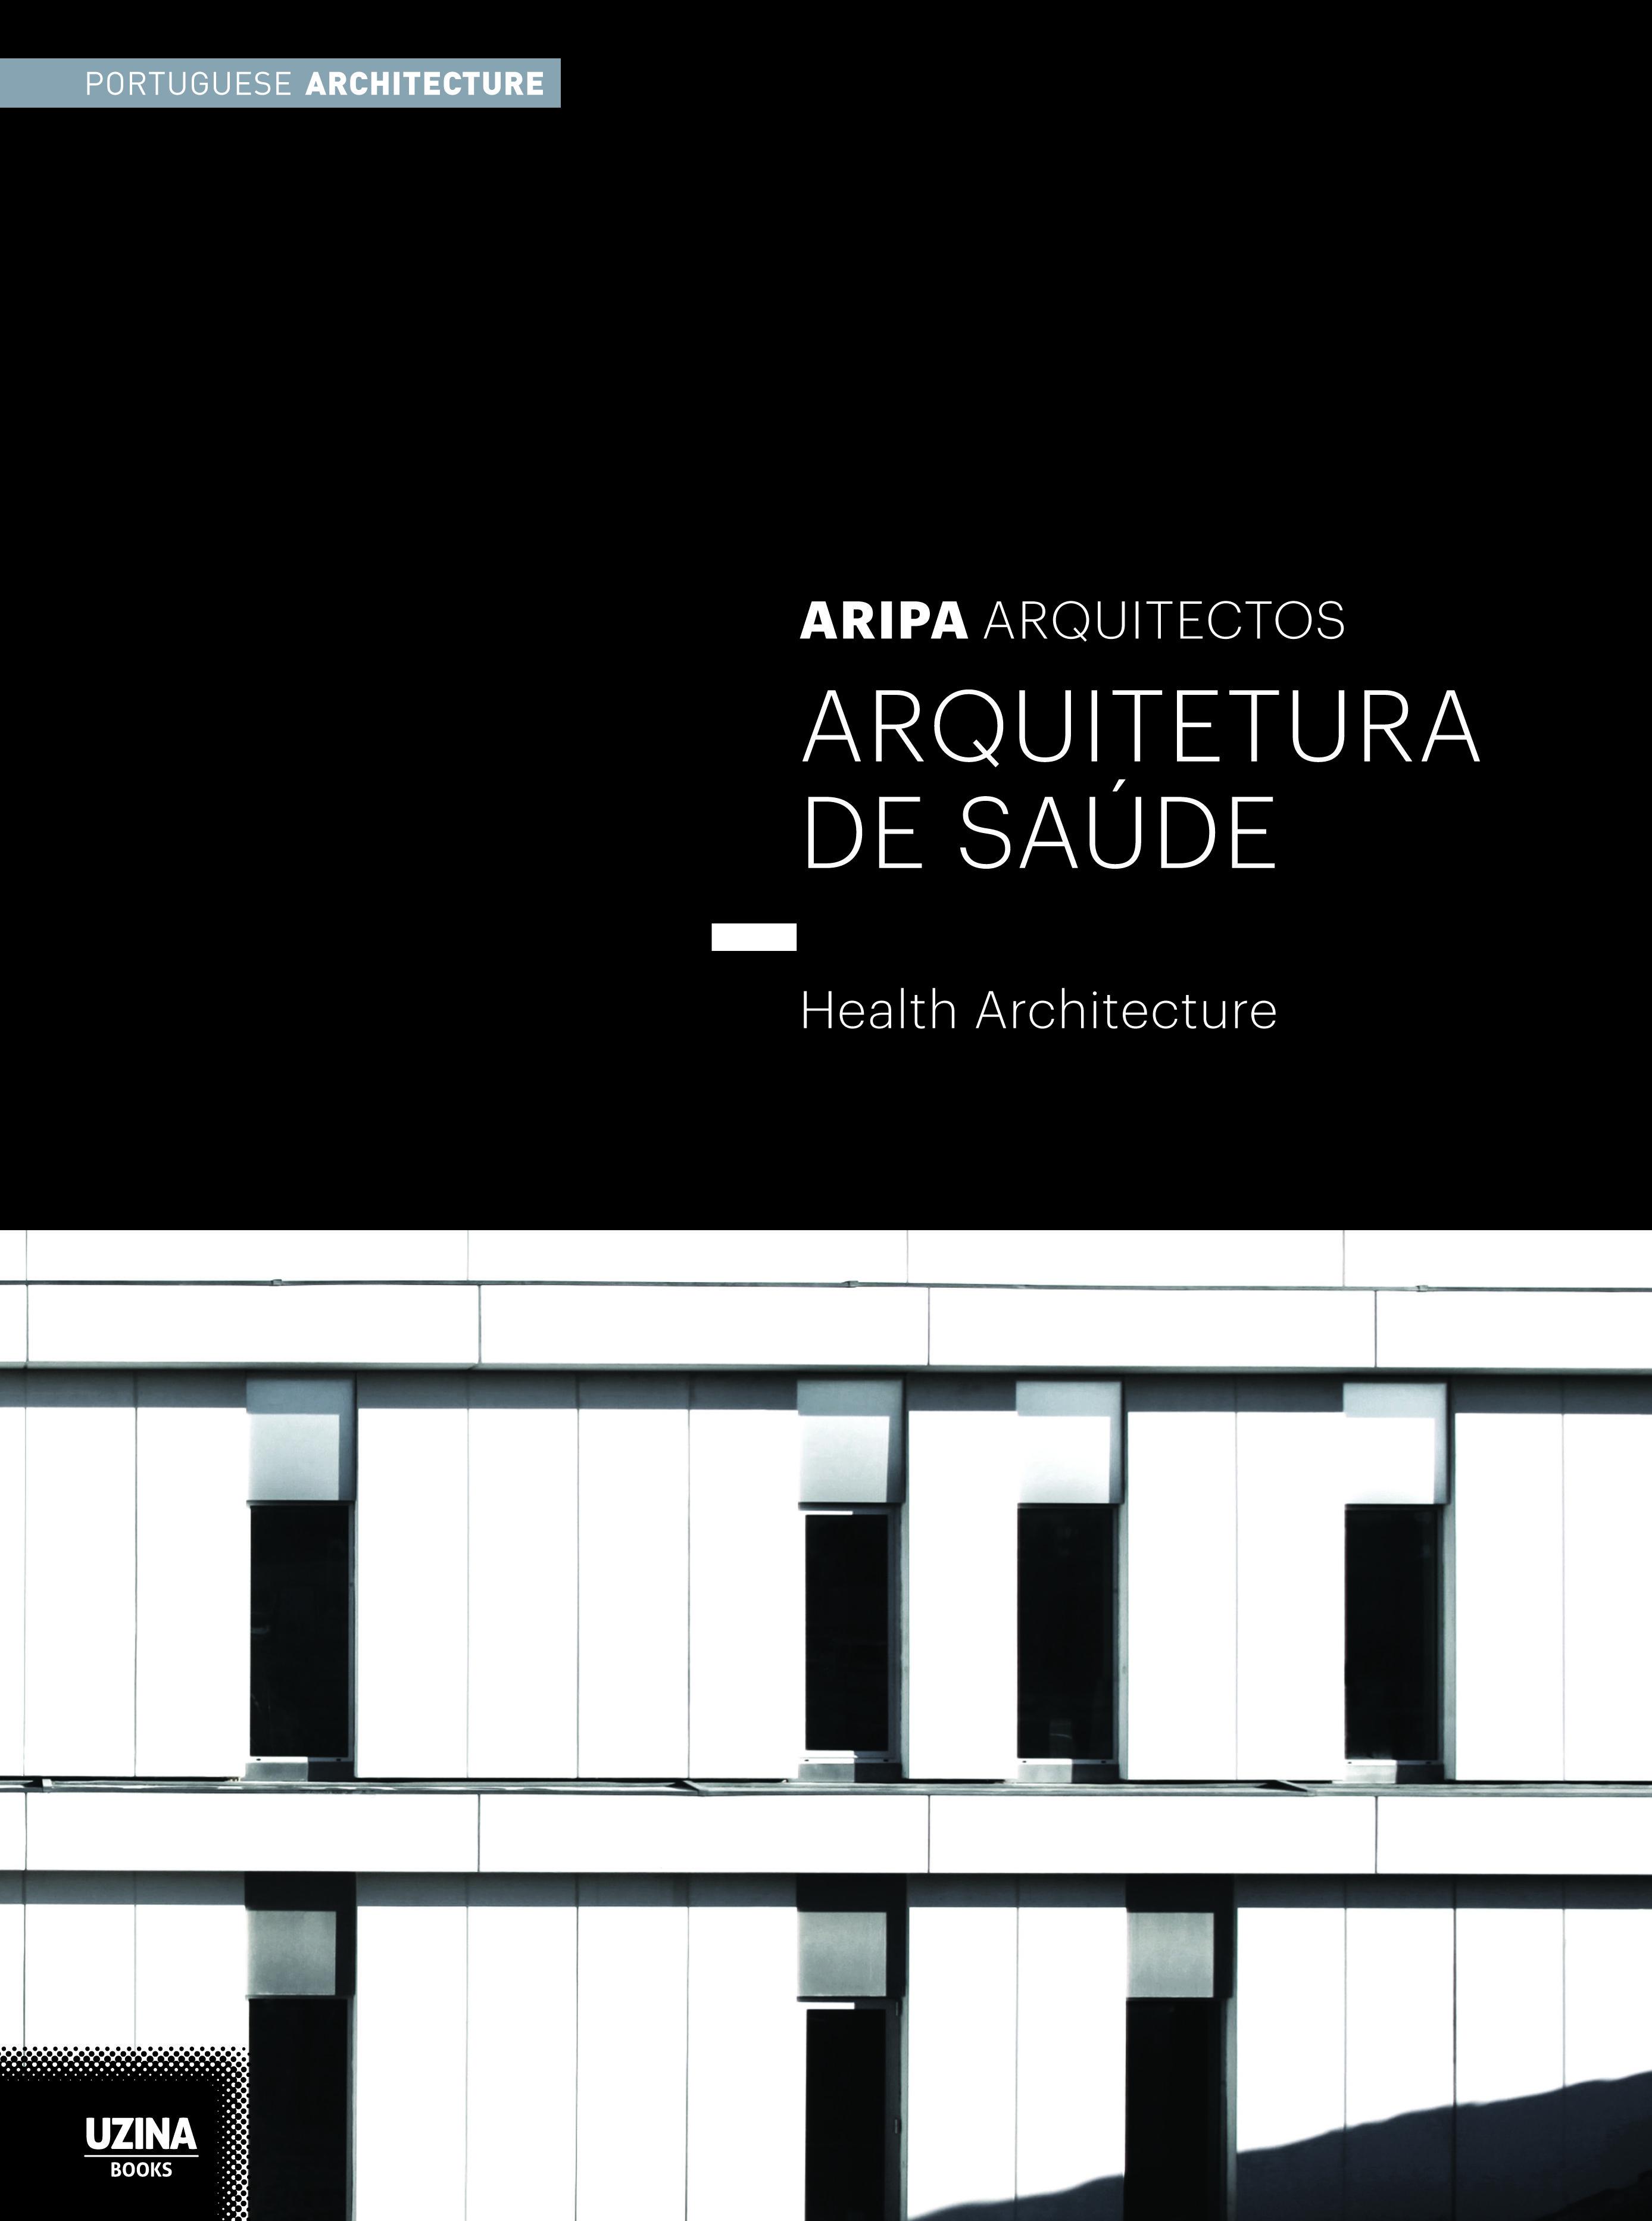 Aripa Arquitectos: arquitetura de saúde= health architecture/ editor José Manuel das Neves. http://kmelot.biblioteca.udc.es/record=b1503710~S1*gag Signatura: 72 Aripa ARP